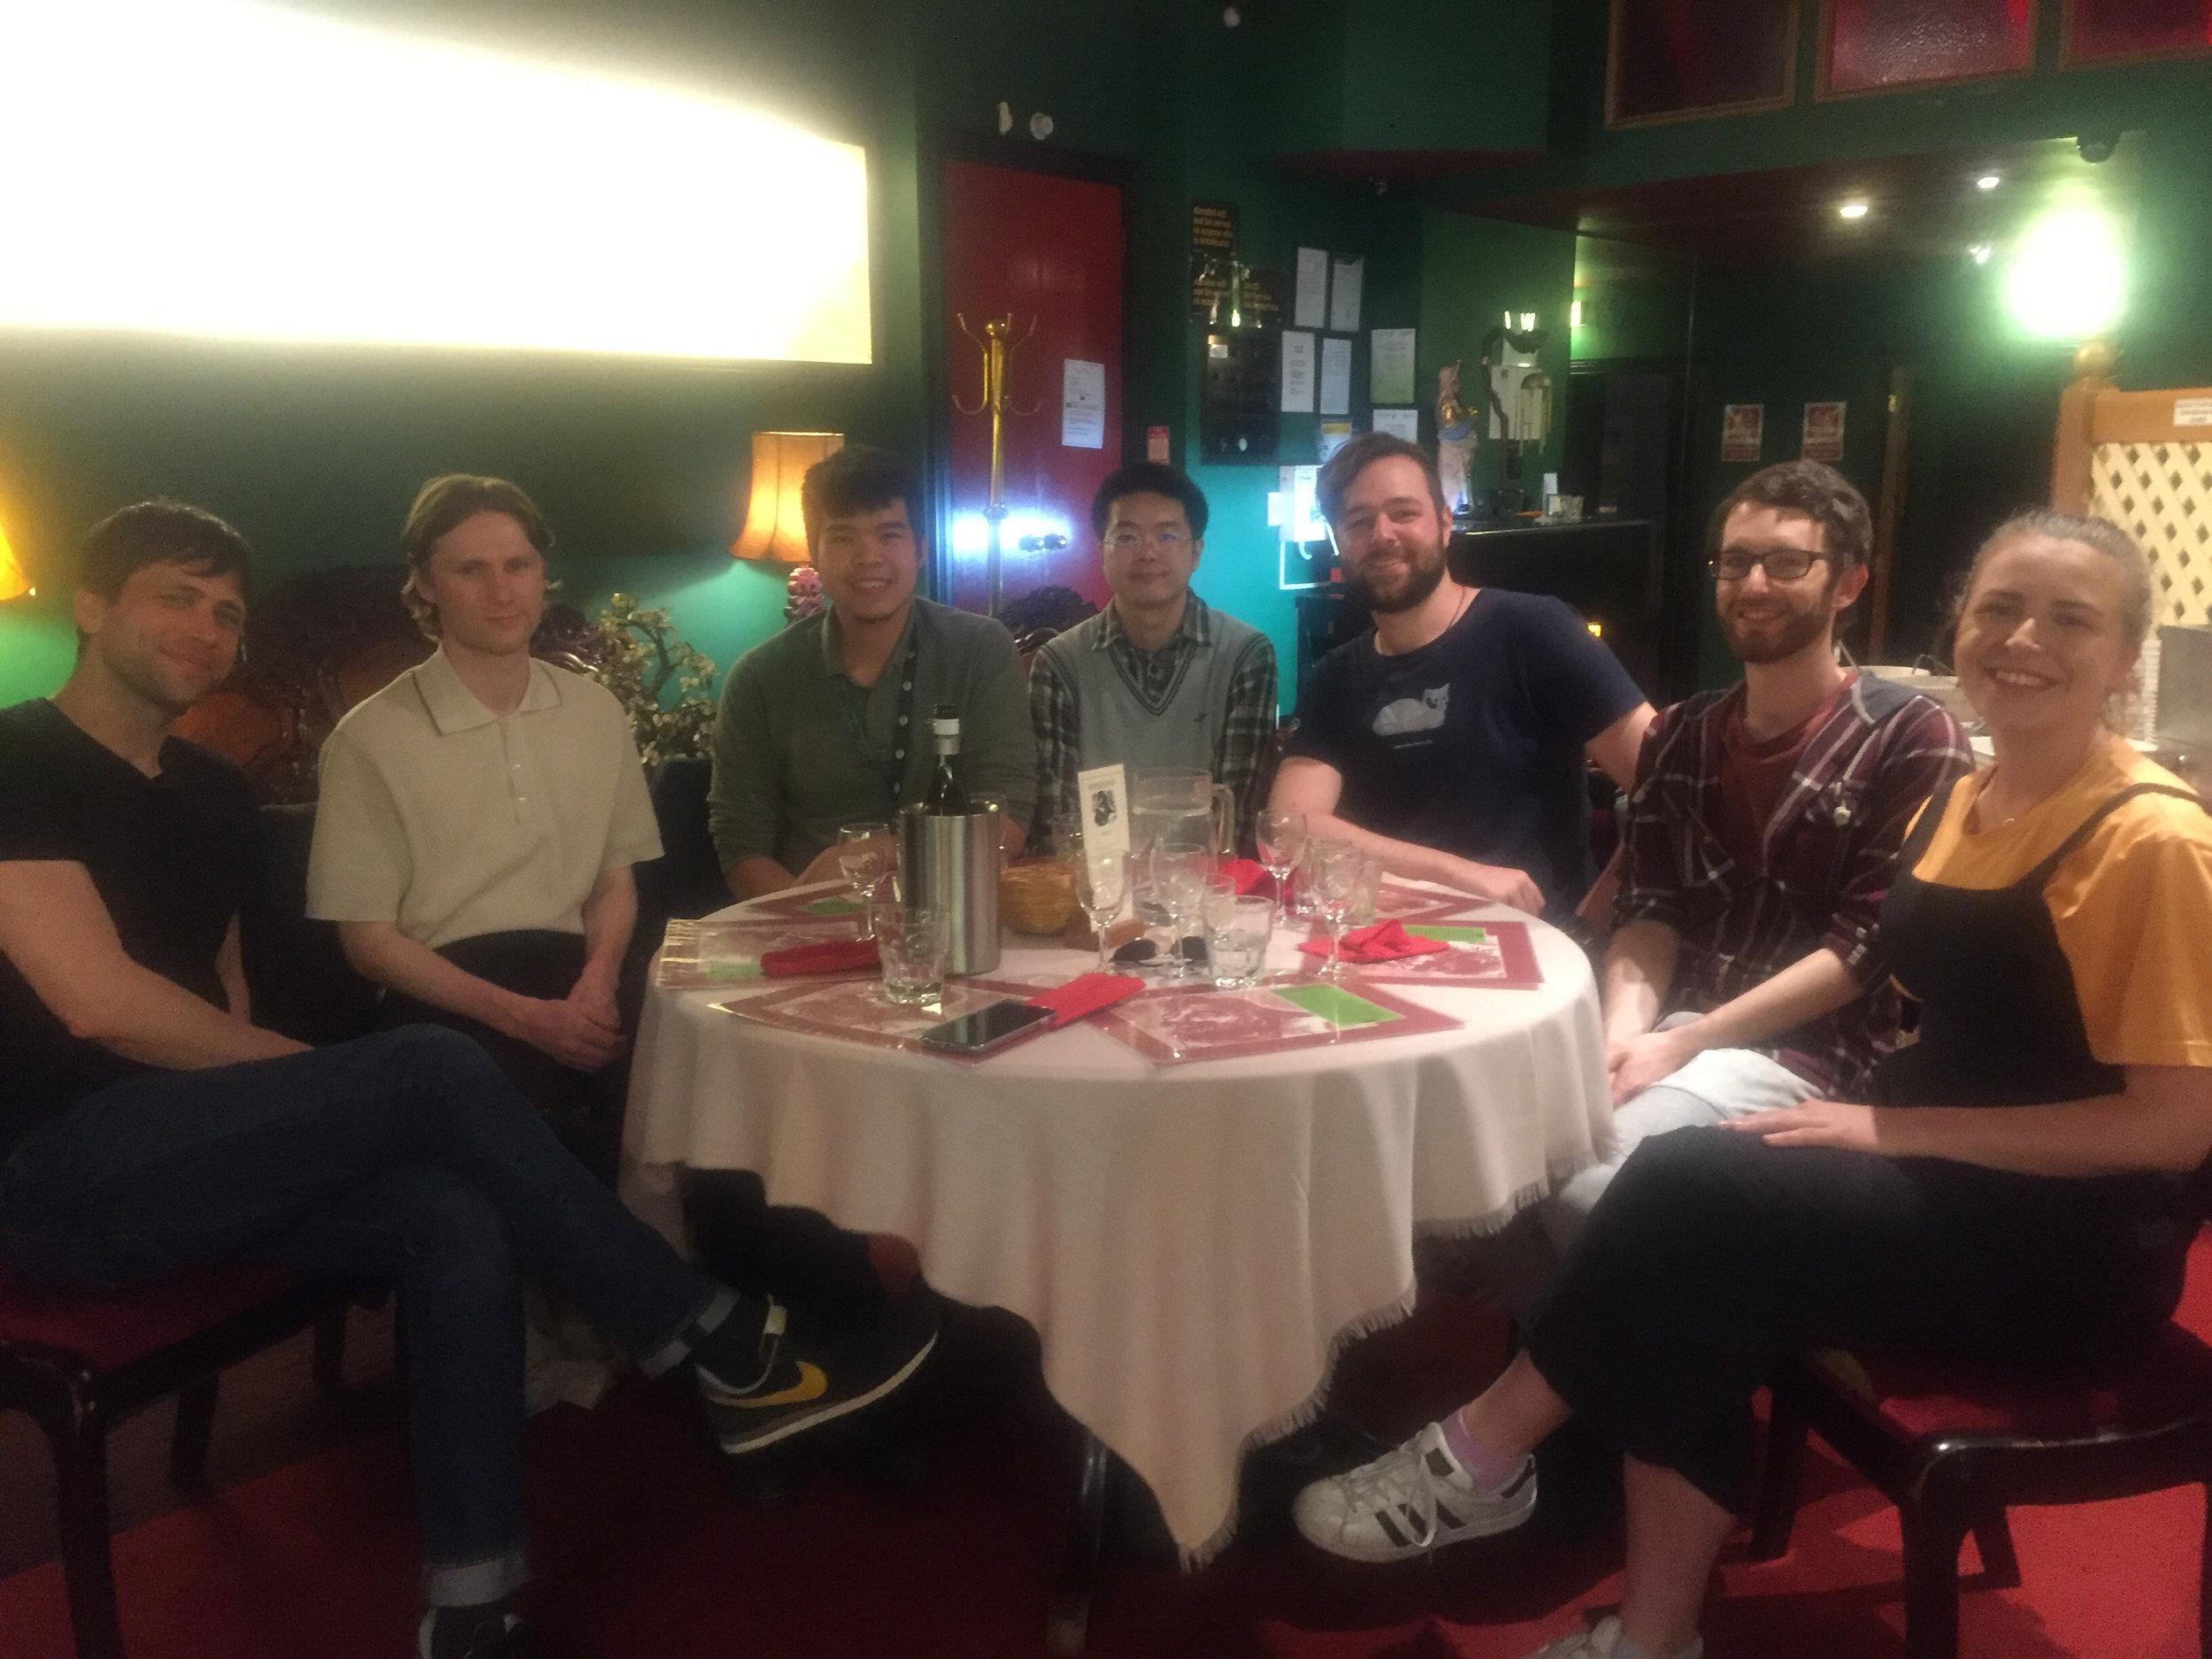 (Starting far Left: Justin Rotolo, Caillan McCrostie, Kyle Phan, Tom Zhang, Joshua Tong, Andrew Peek, Courtney Gilbert)